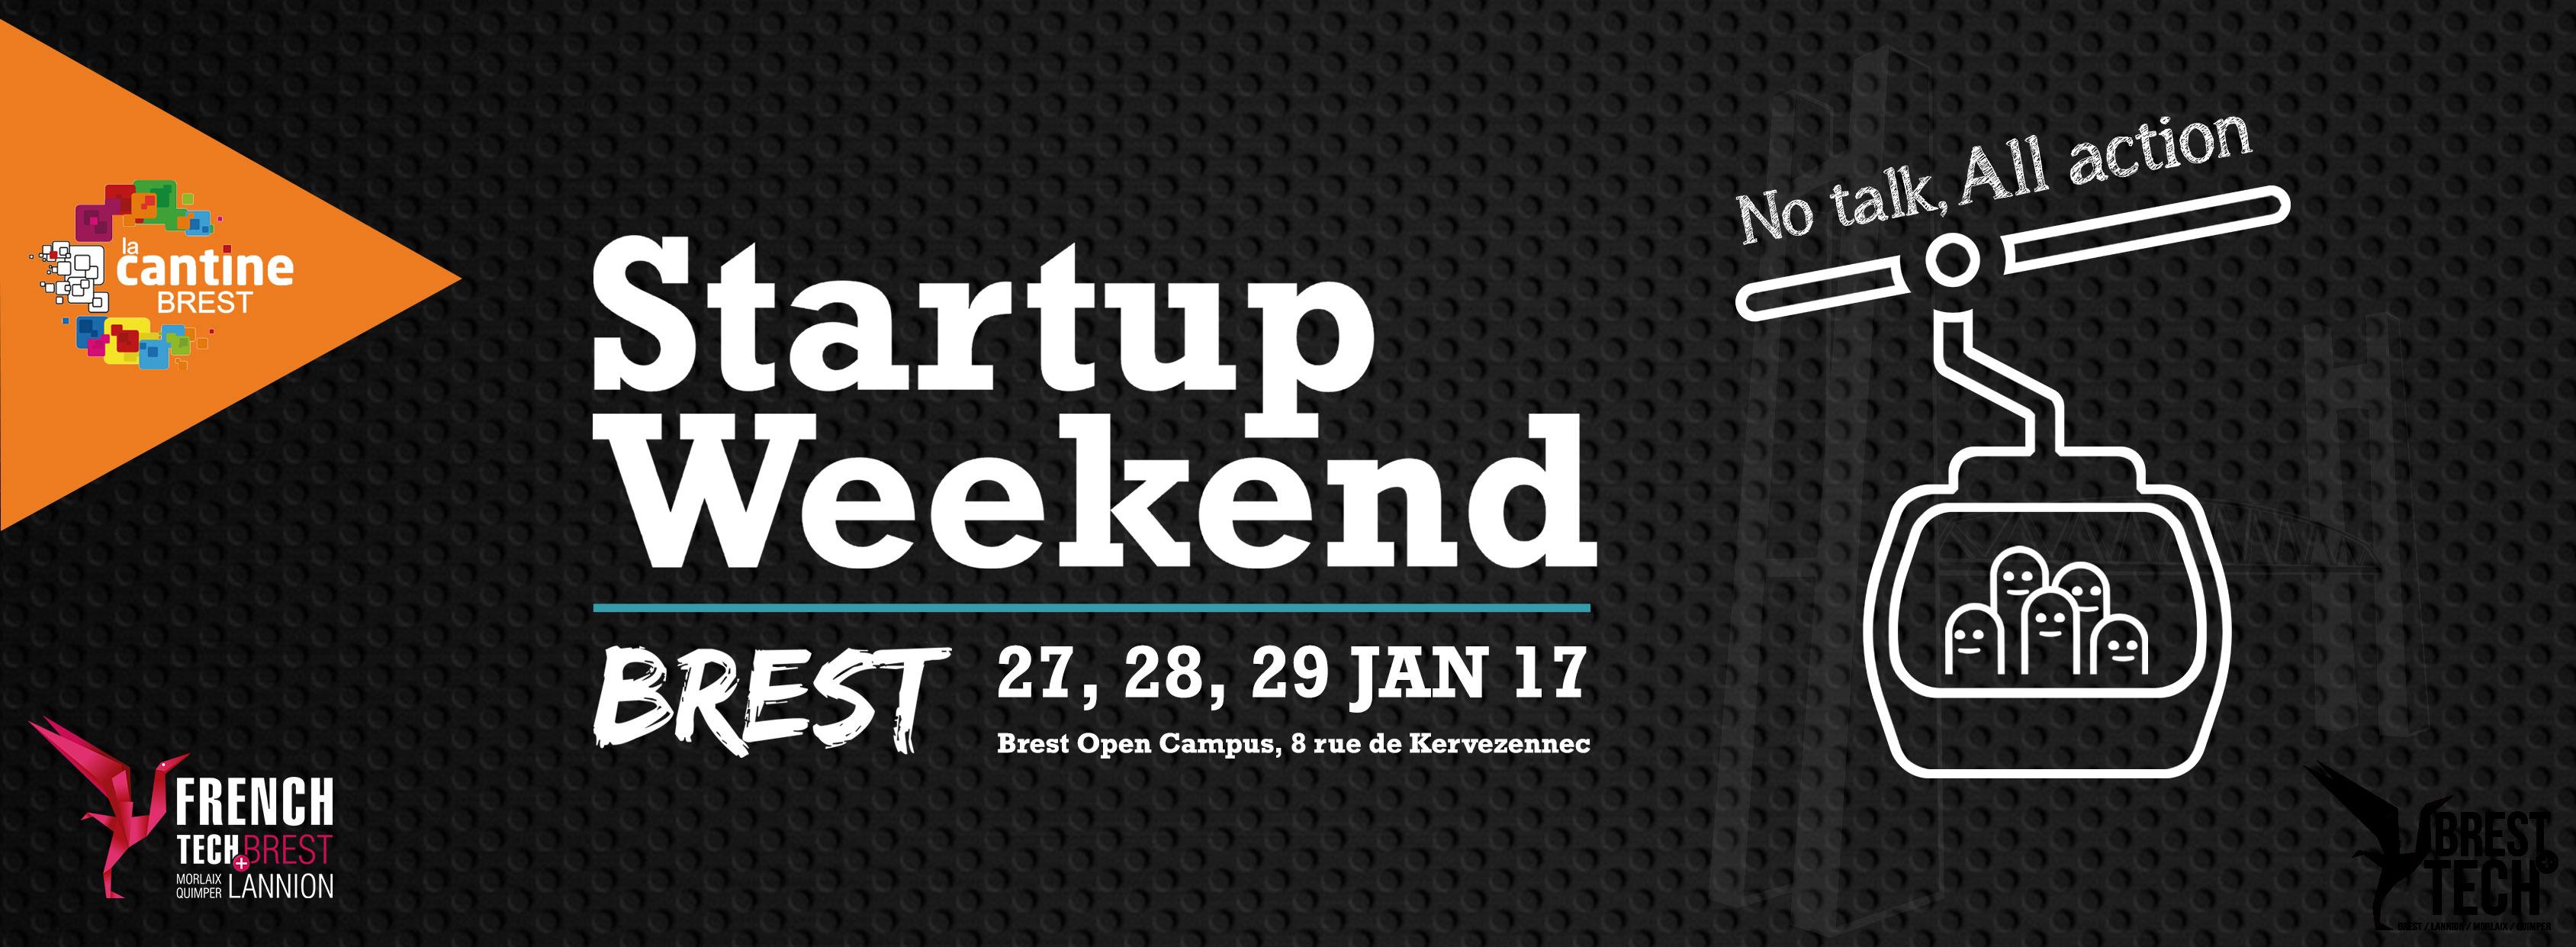 Startup Weekend #4 : la billetterie est ouverte! @ Brest Open Campus   Brest   Bretagne   France